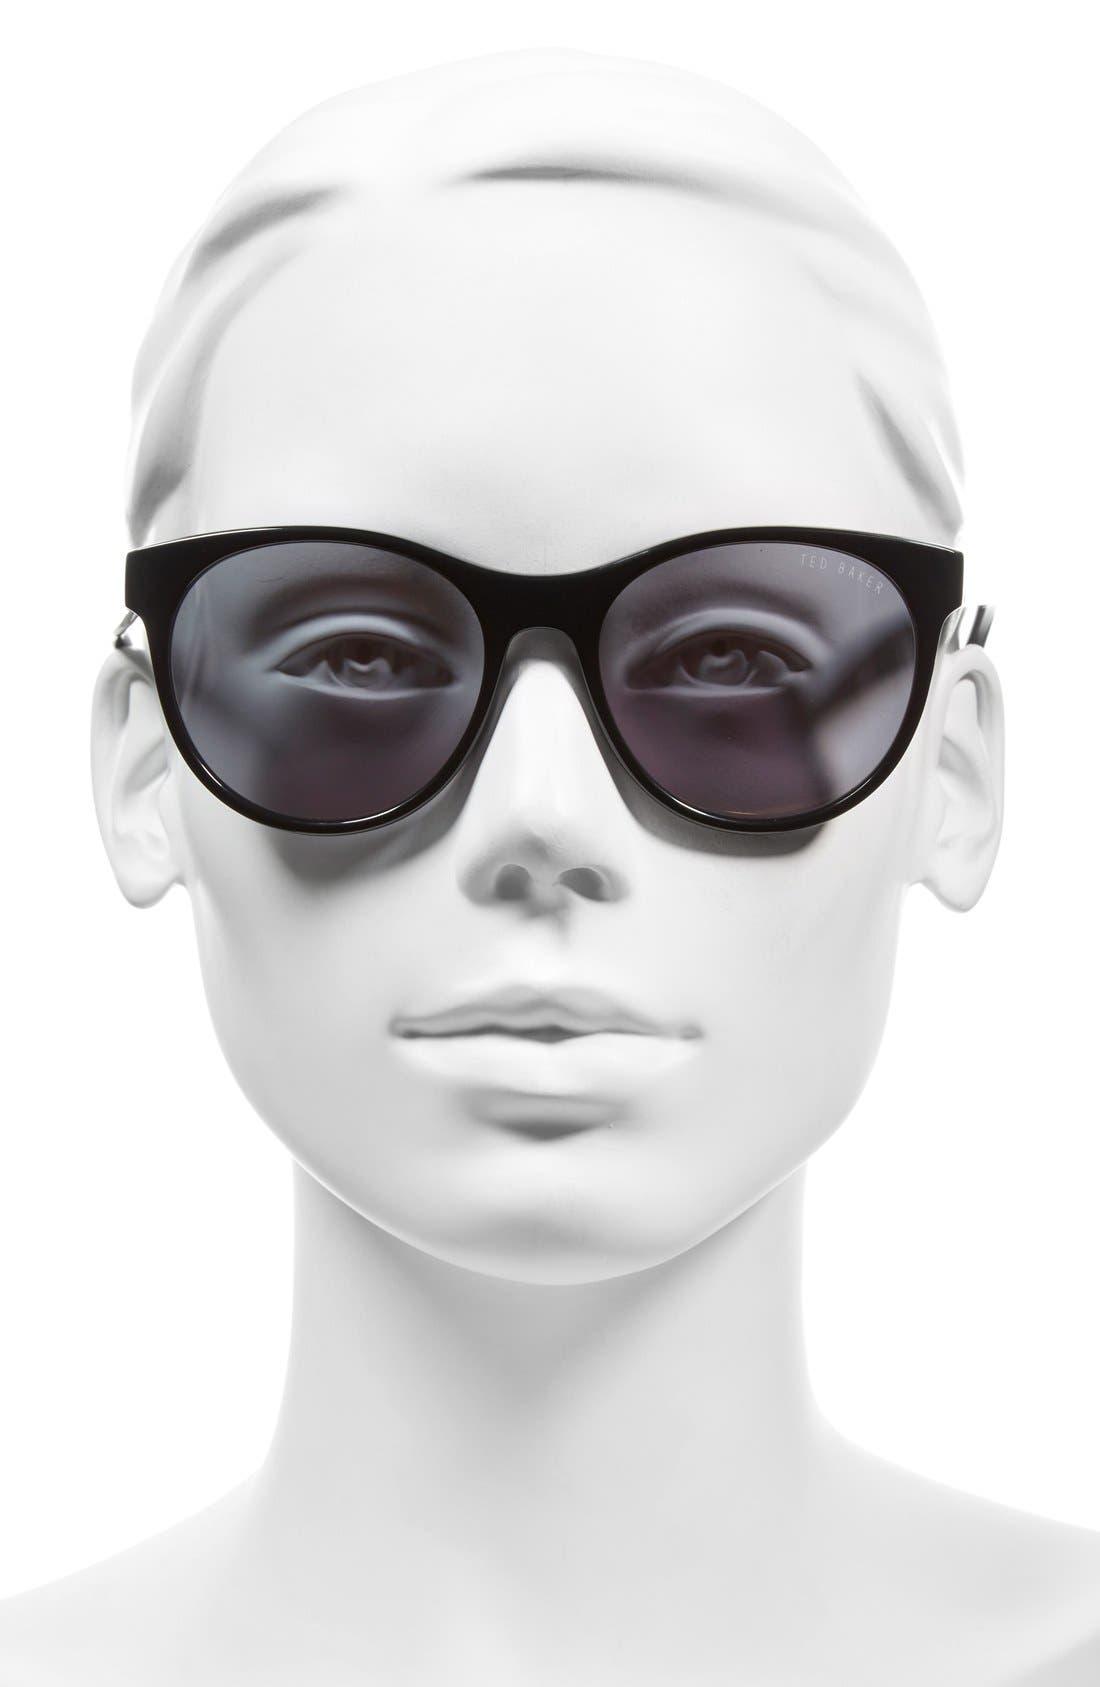 54mm Retro Sunglasses,                             Alternate thumbnail 6, color,